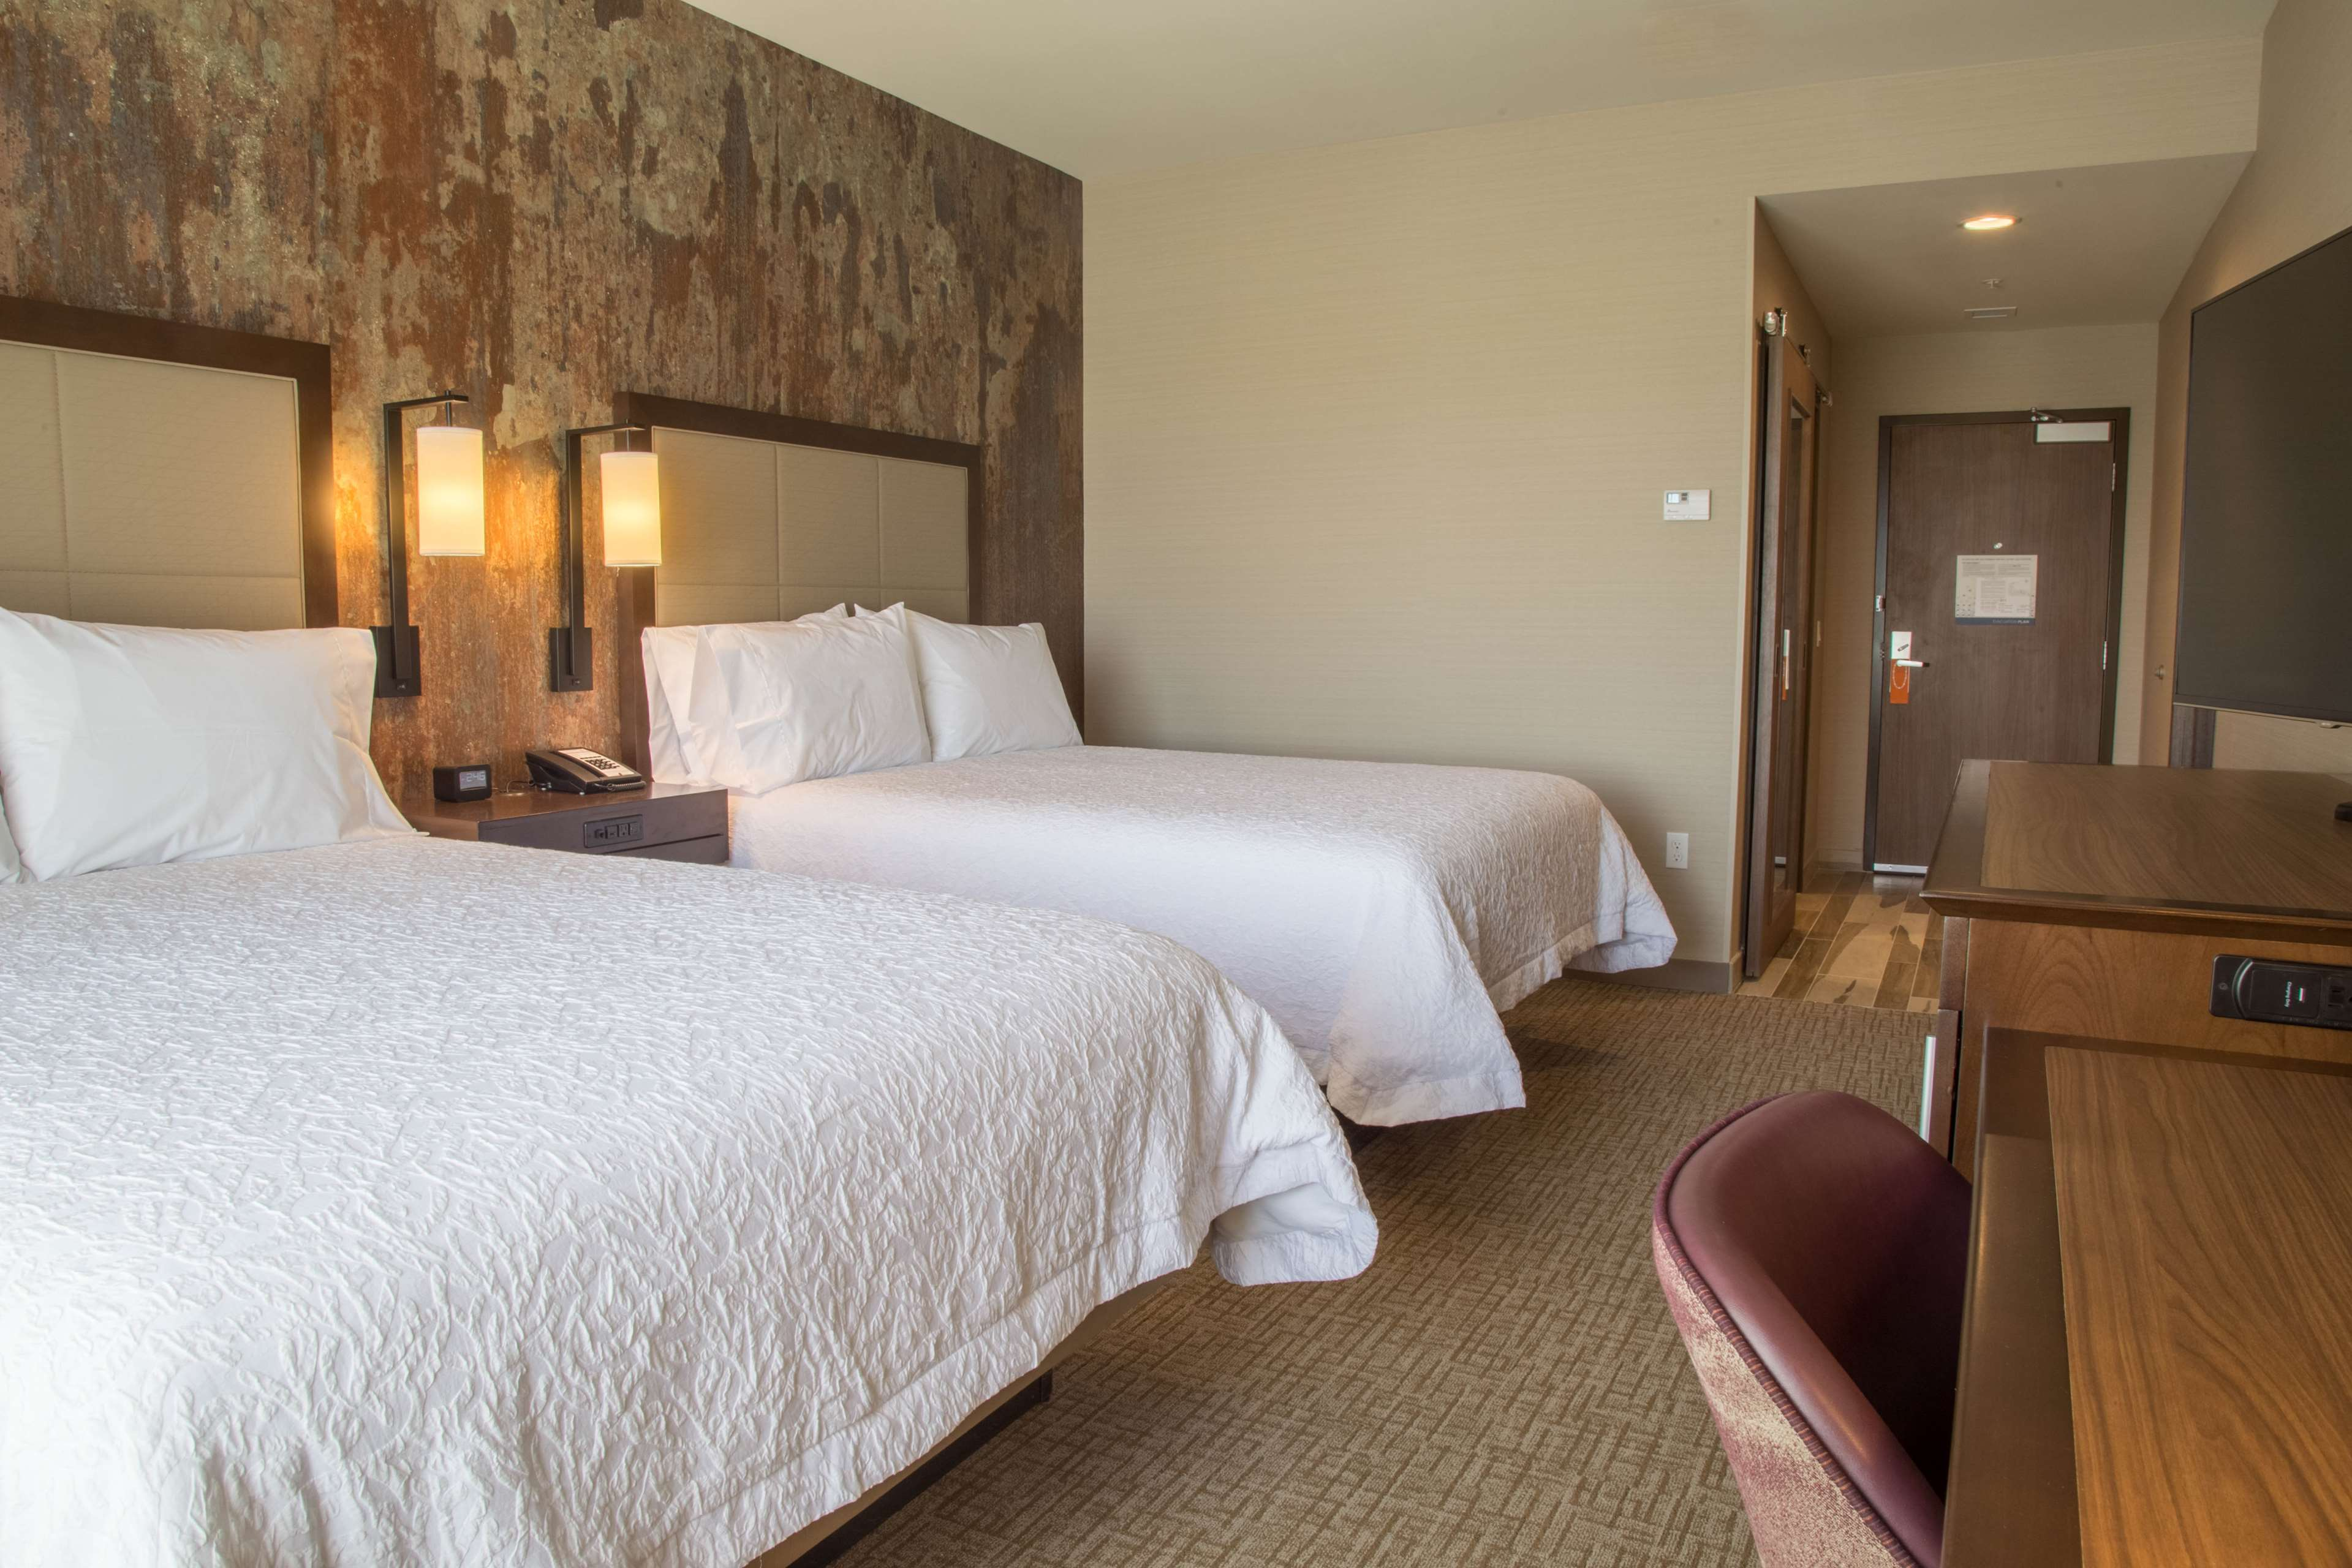 Hampton Inn & Suites Murrieta Temecula image 17